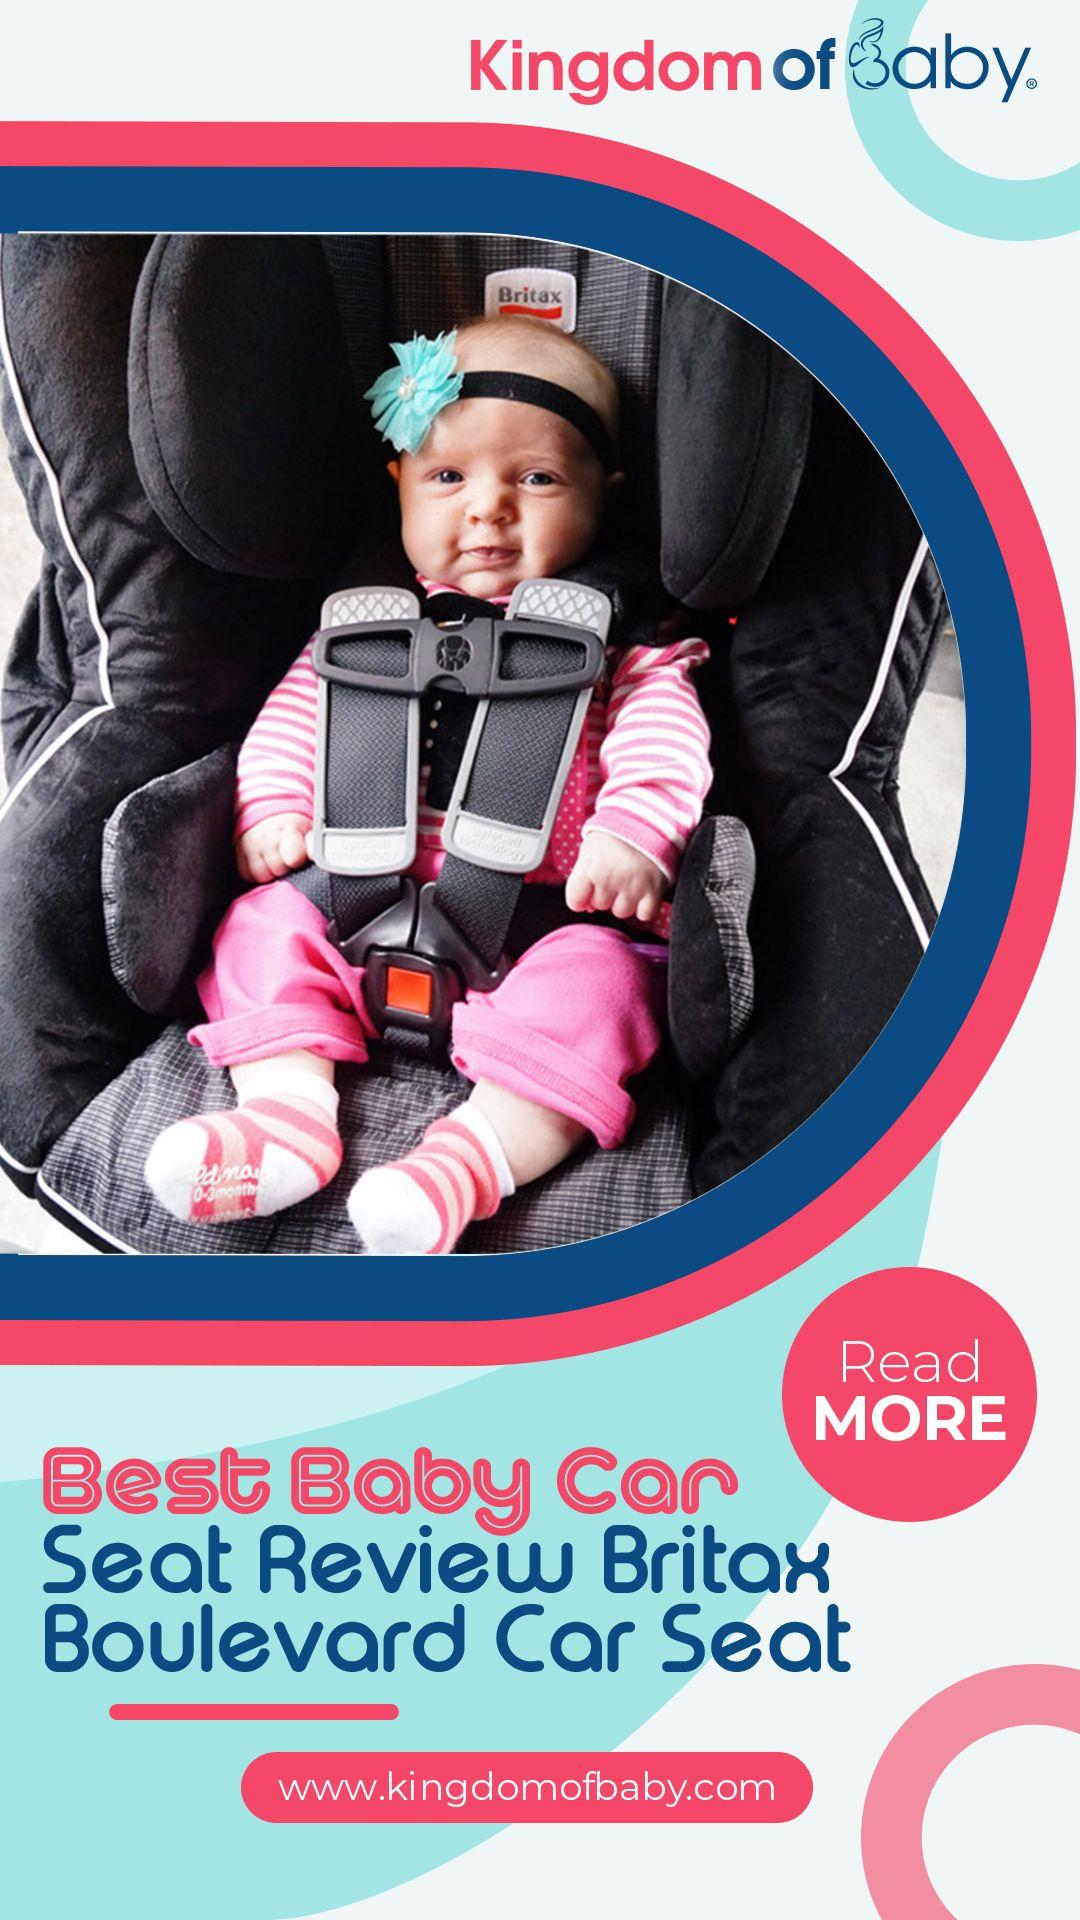 Best Baby Car Seat Review Britax Boulevard Car Seat Best